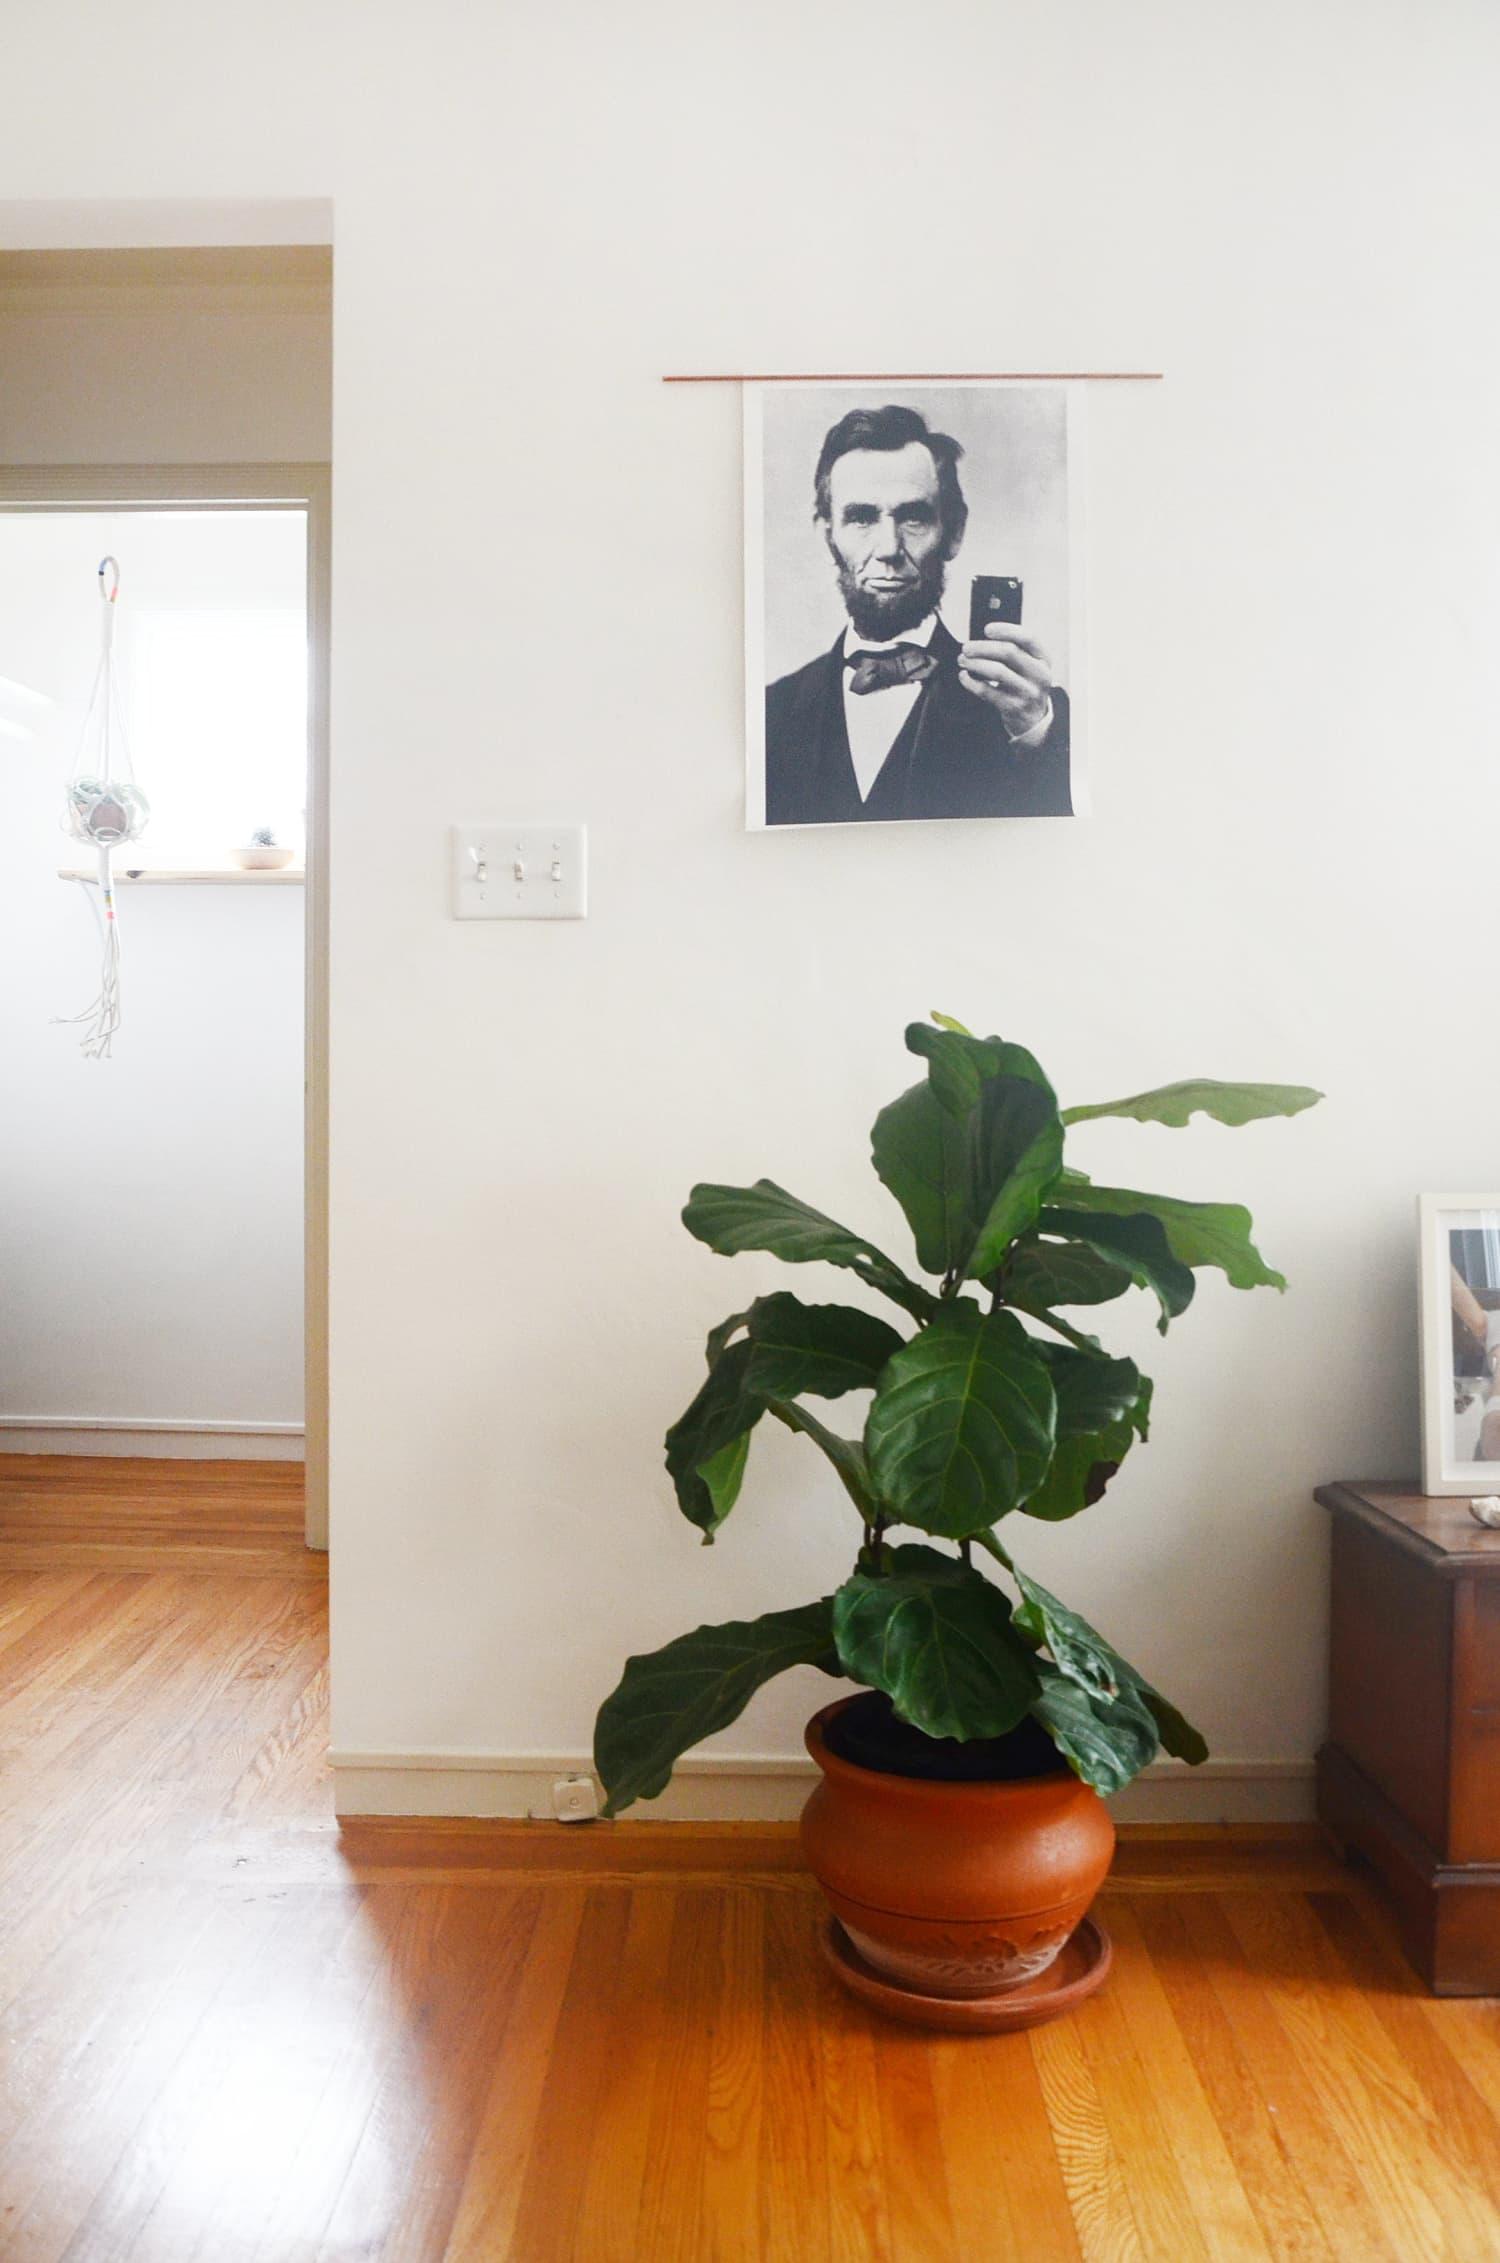 New Home Decor Plant Trend: The Pothos Plant | Apartment ...